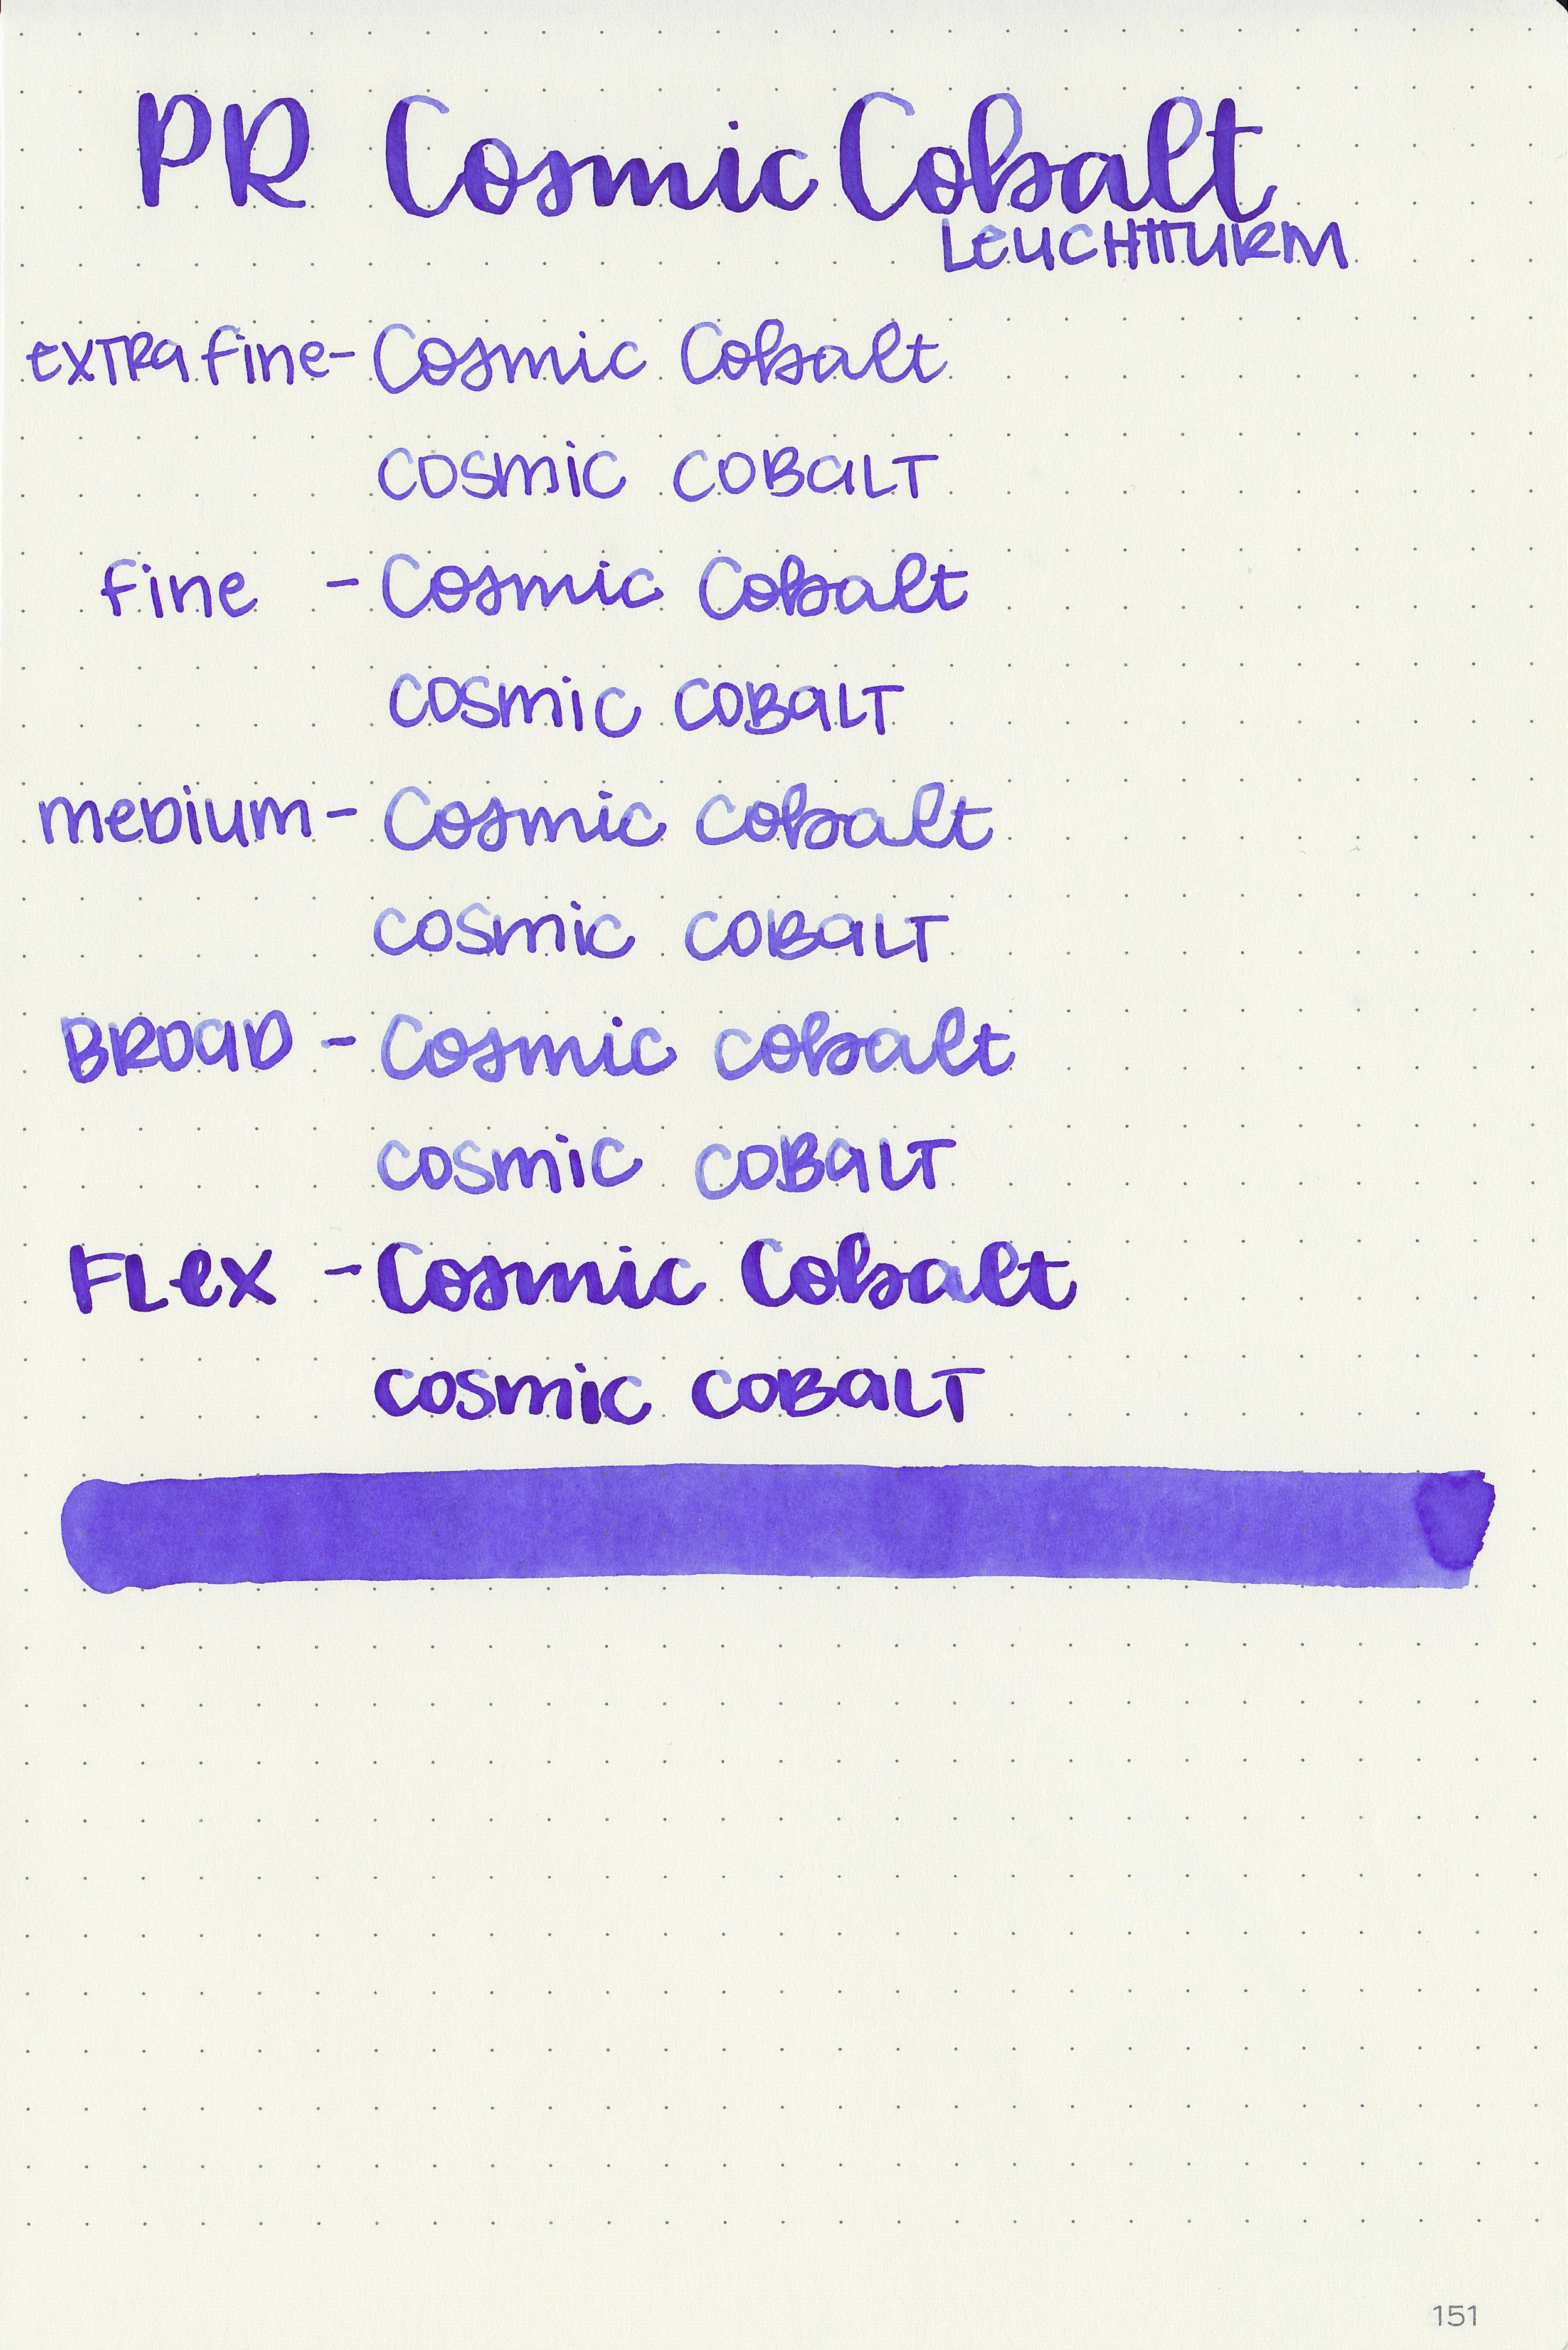 pr-cosmic-cobalt-10.jpg